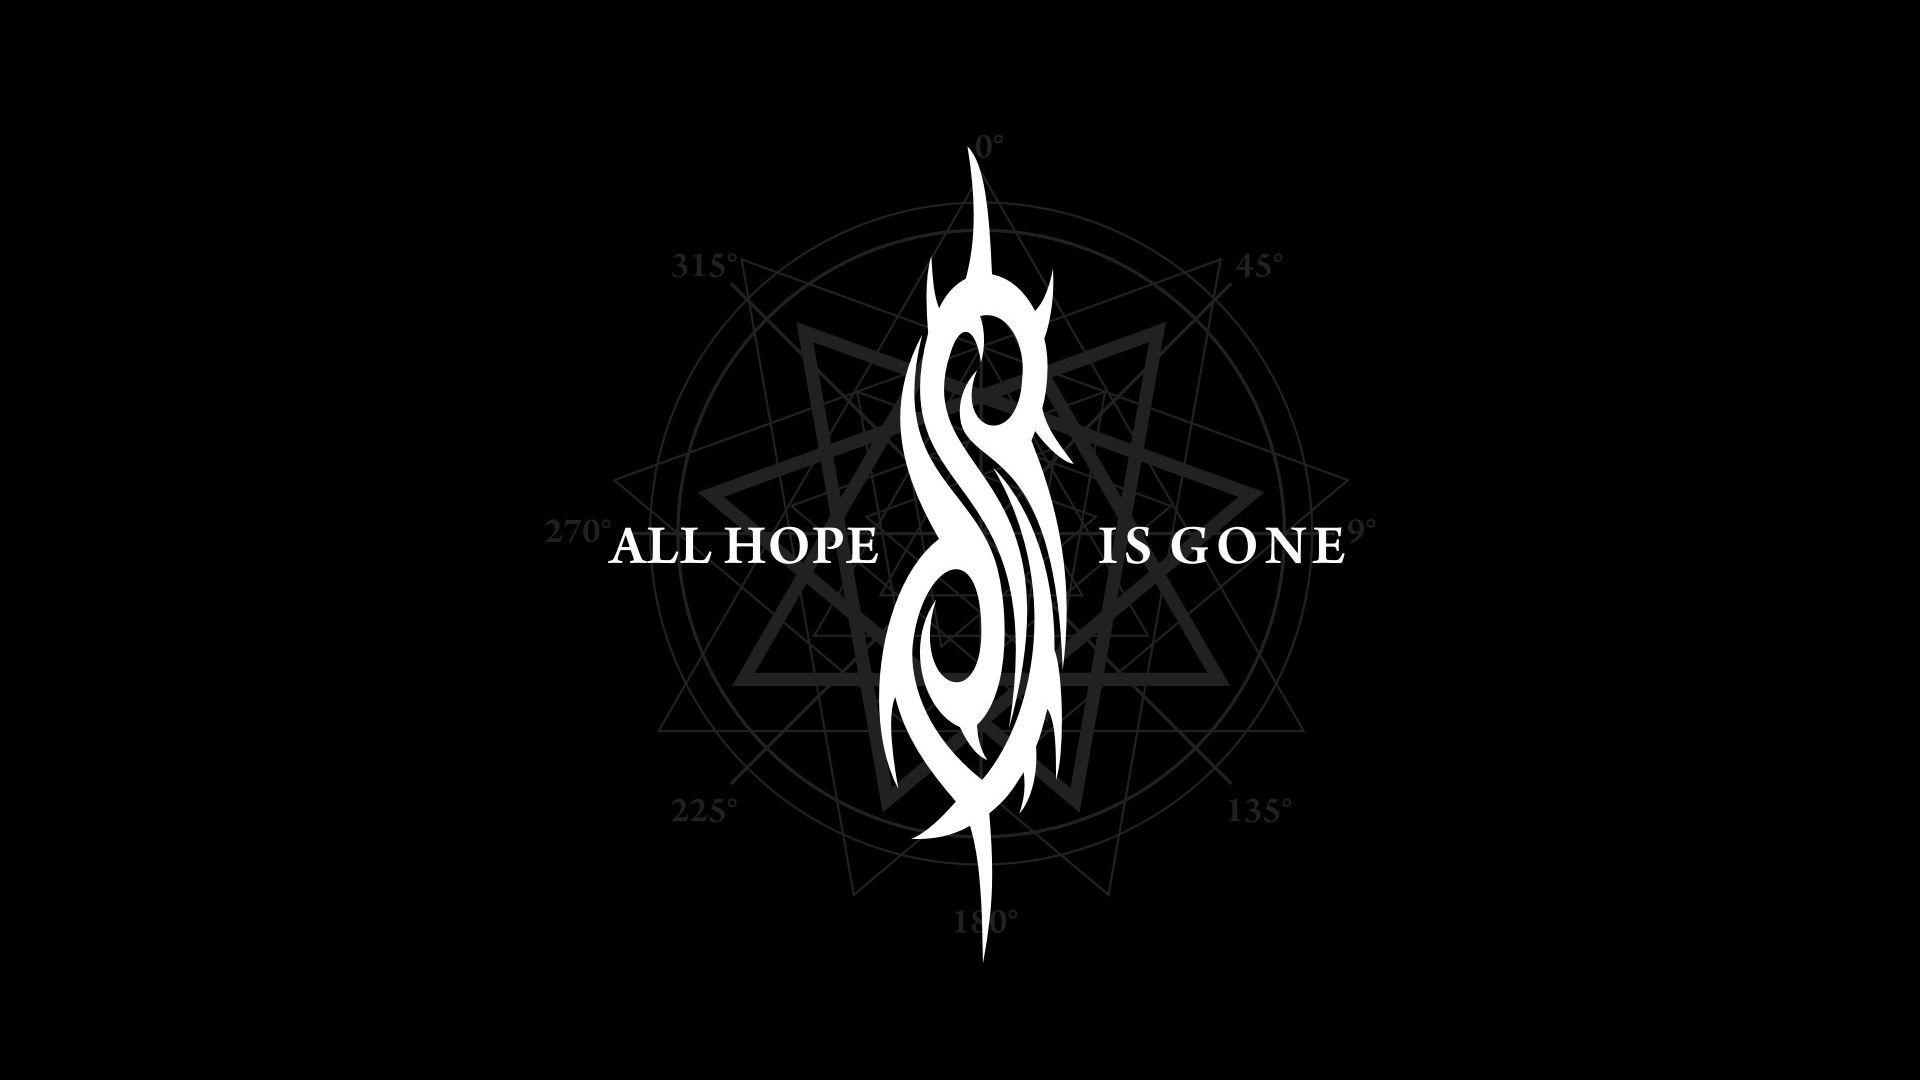 Slipknot Wallpapers All Hope Is Gone Wallpaper Cave